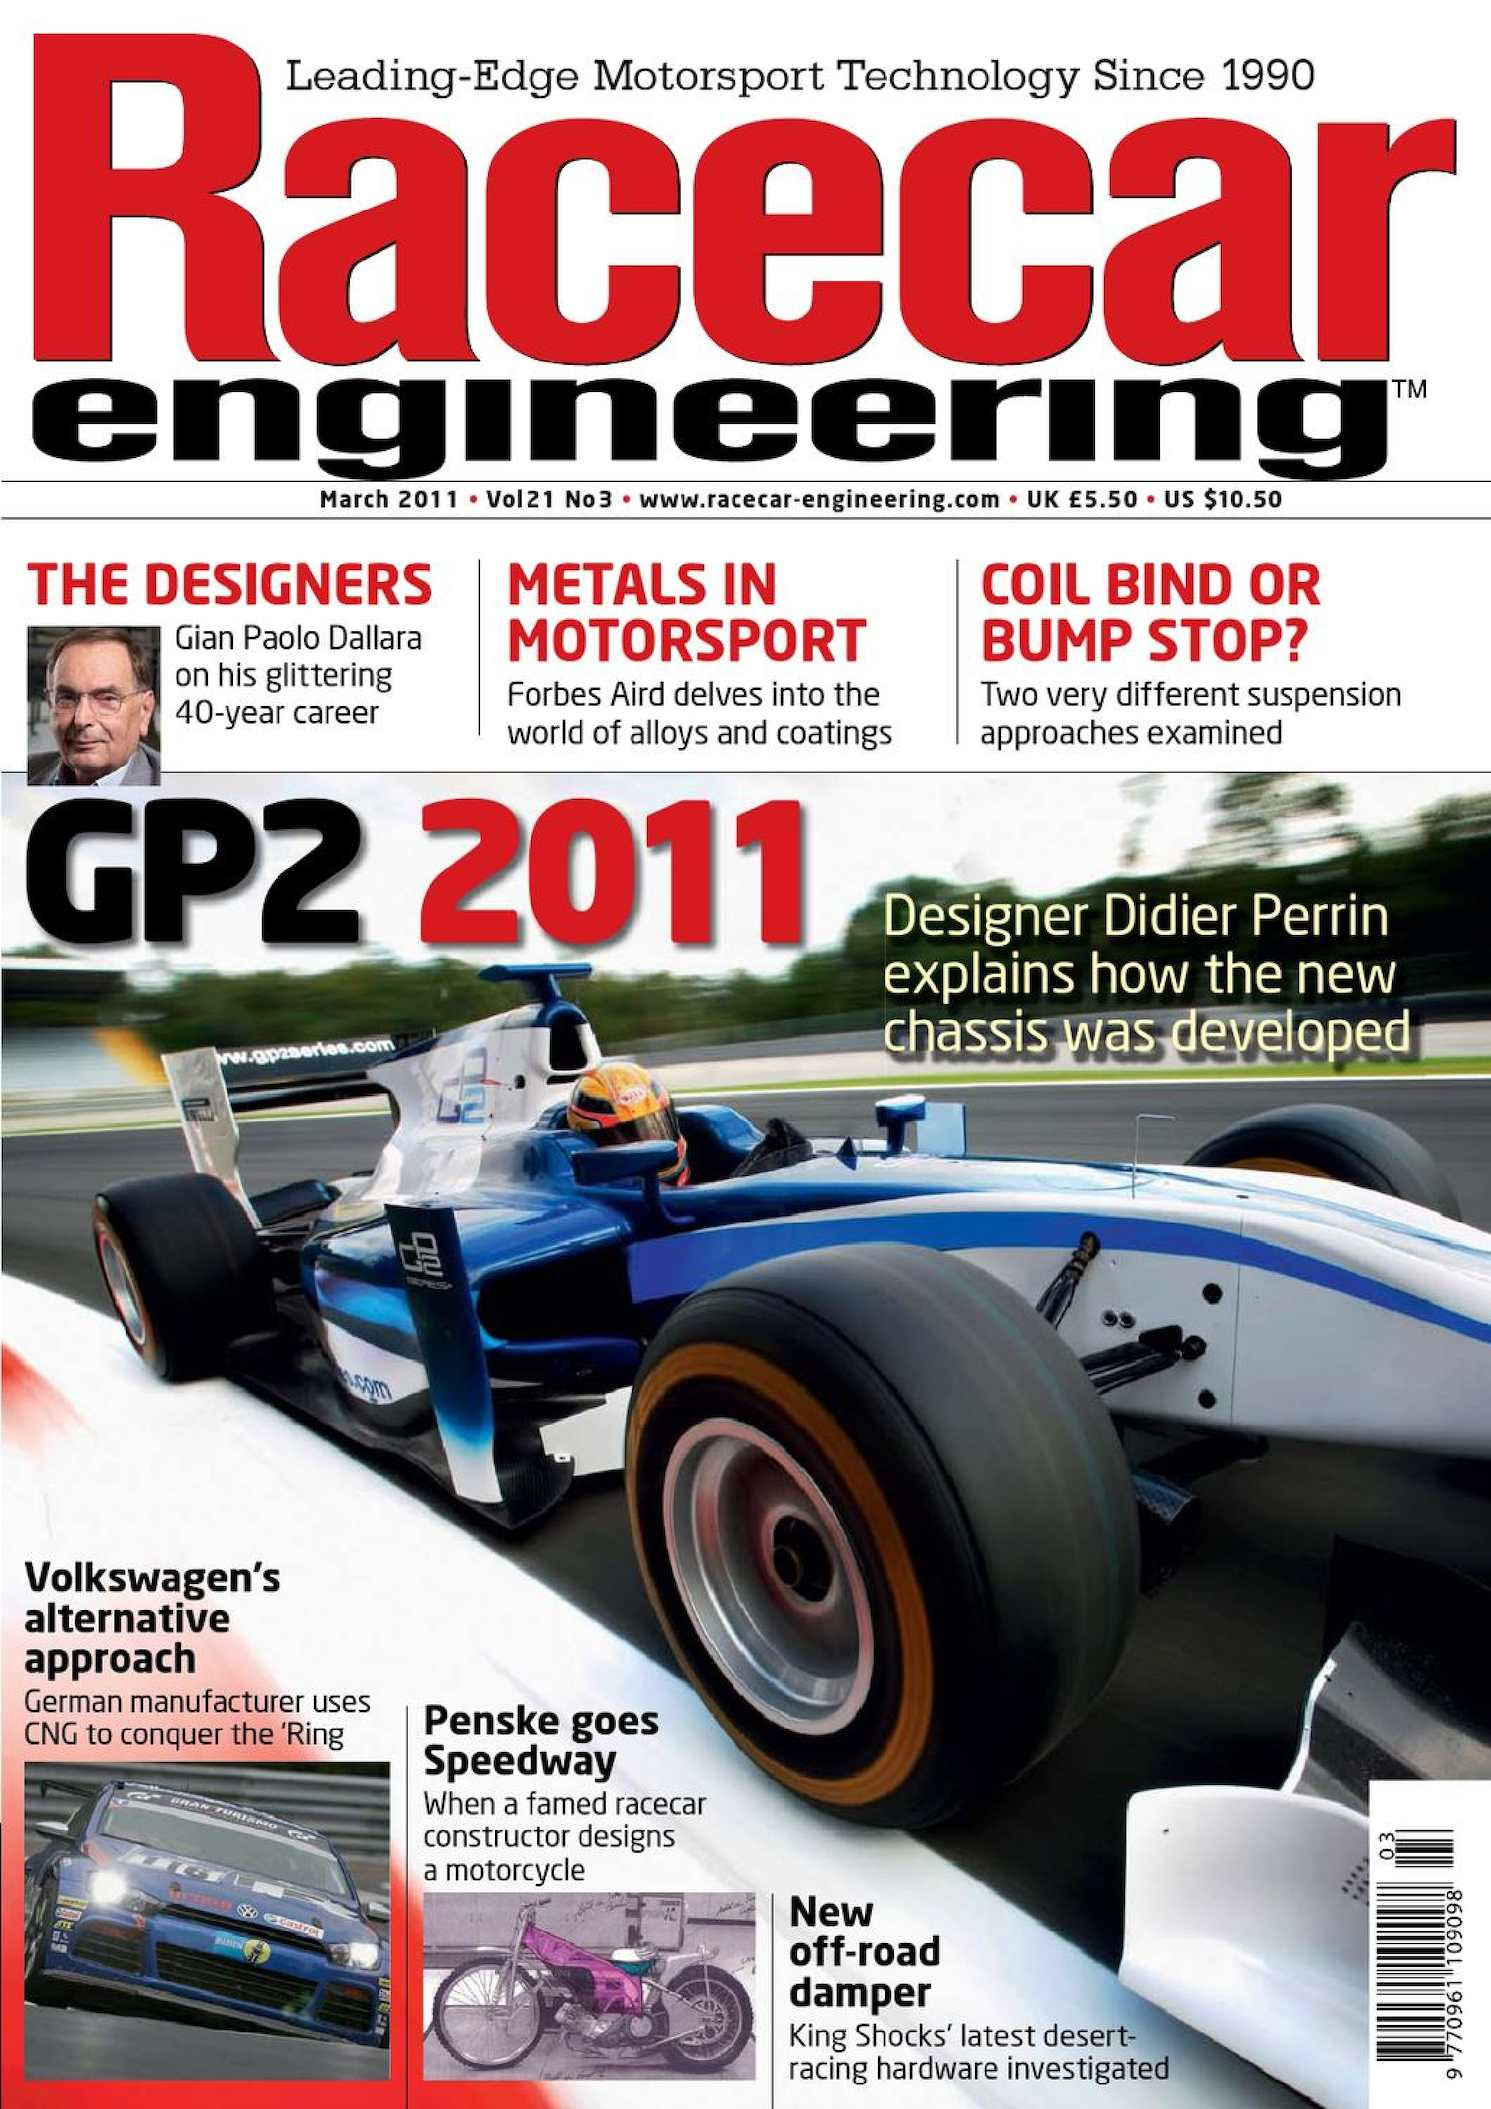 Racecar Engineering March 2011